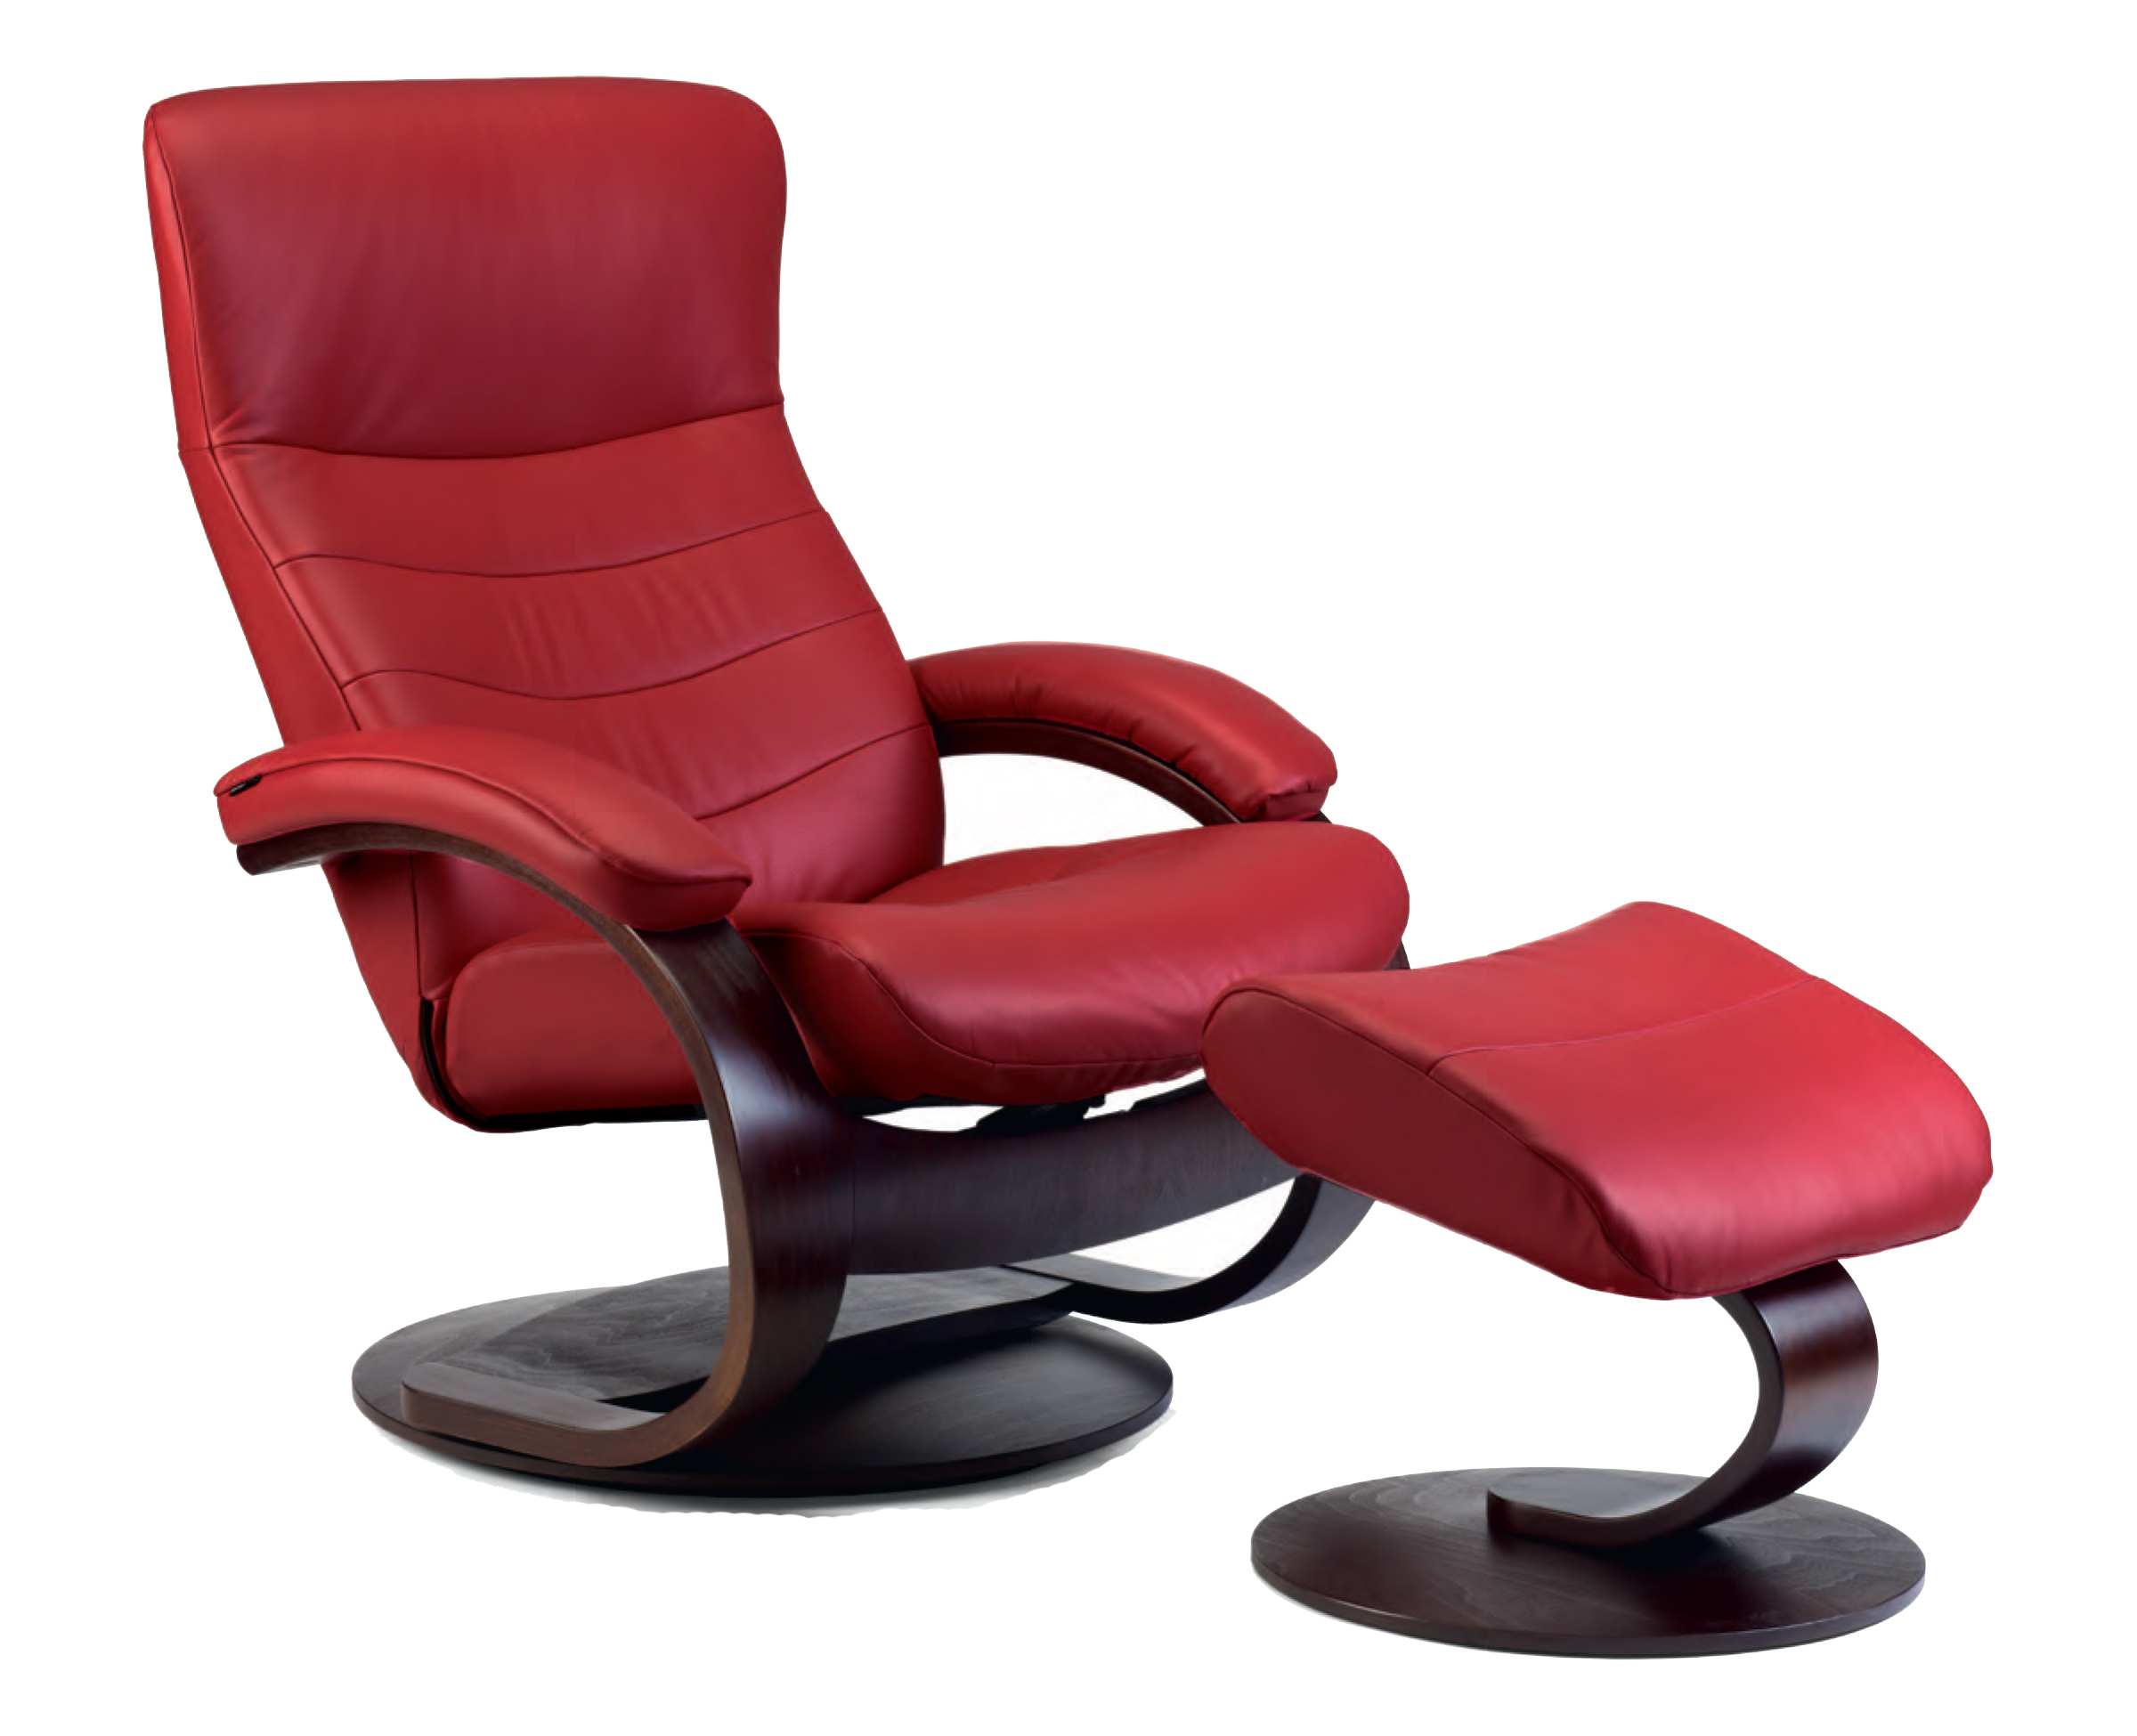 Fjords Trandal Ergonomic Leather C Frame Recliner Chair